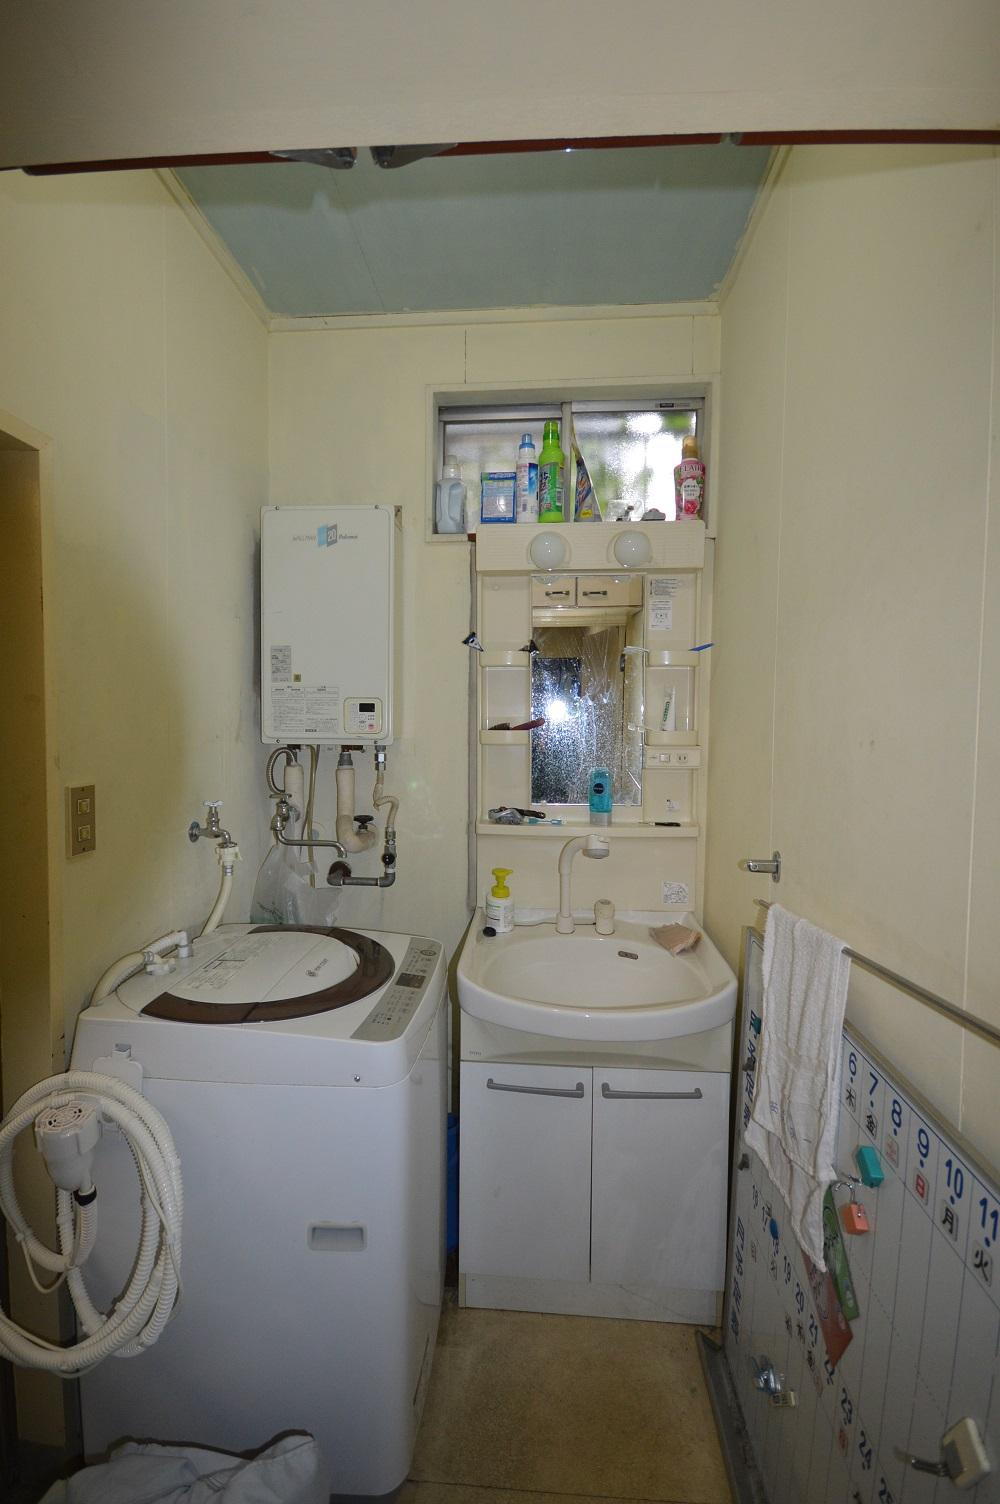 Before:屋内にあった給湯器は、屋外設置の省エネ型に変更